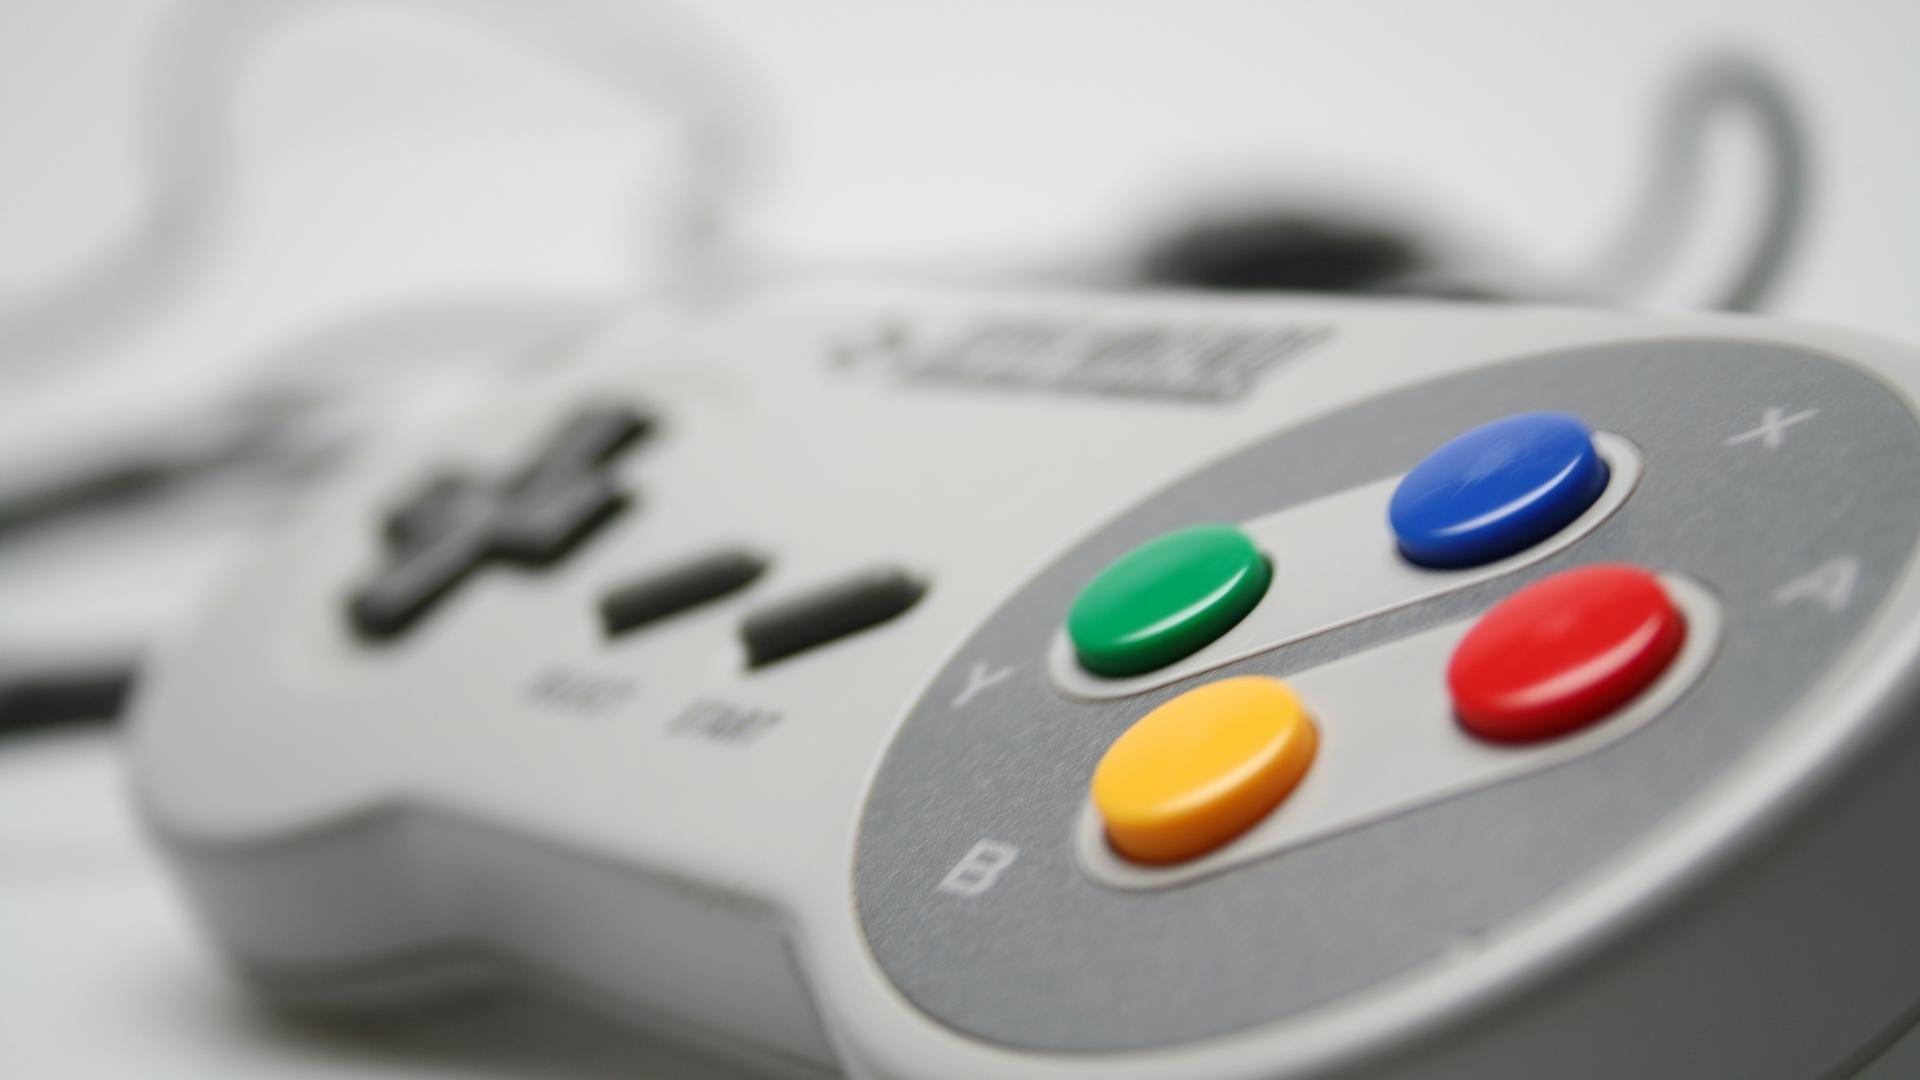 Super Nintendo Controller HD Wallpaper